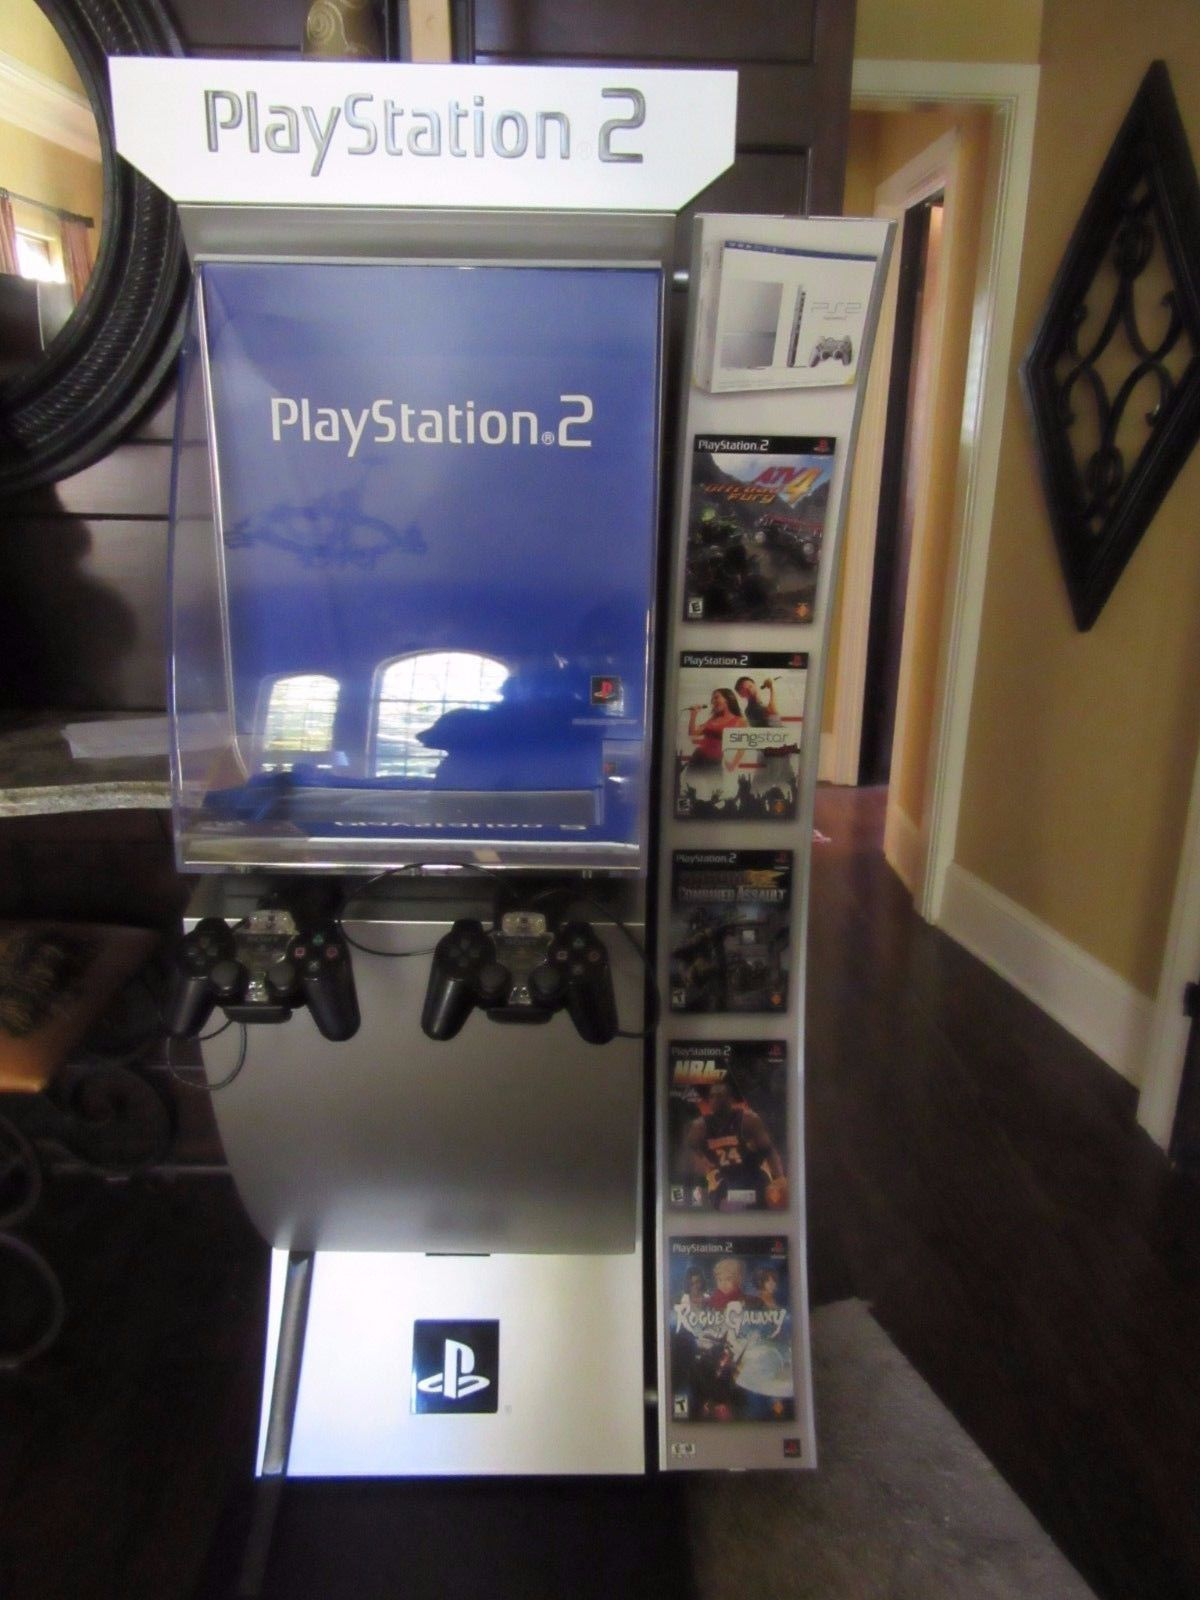 playstation 2 kiosk, ps2 kiosk